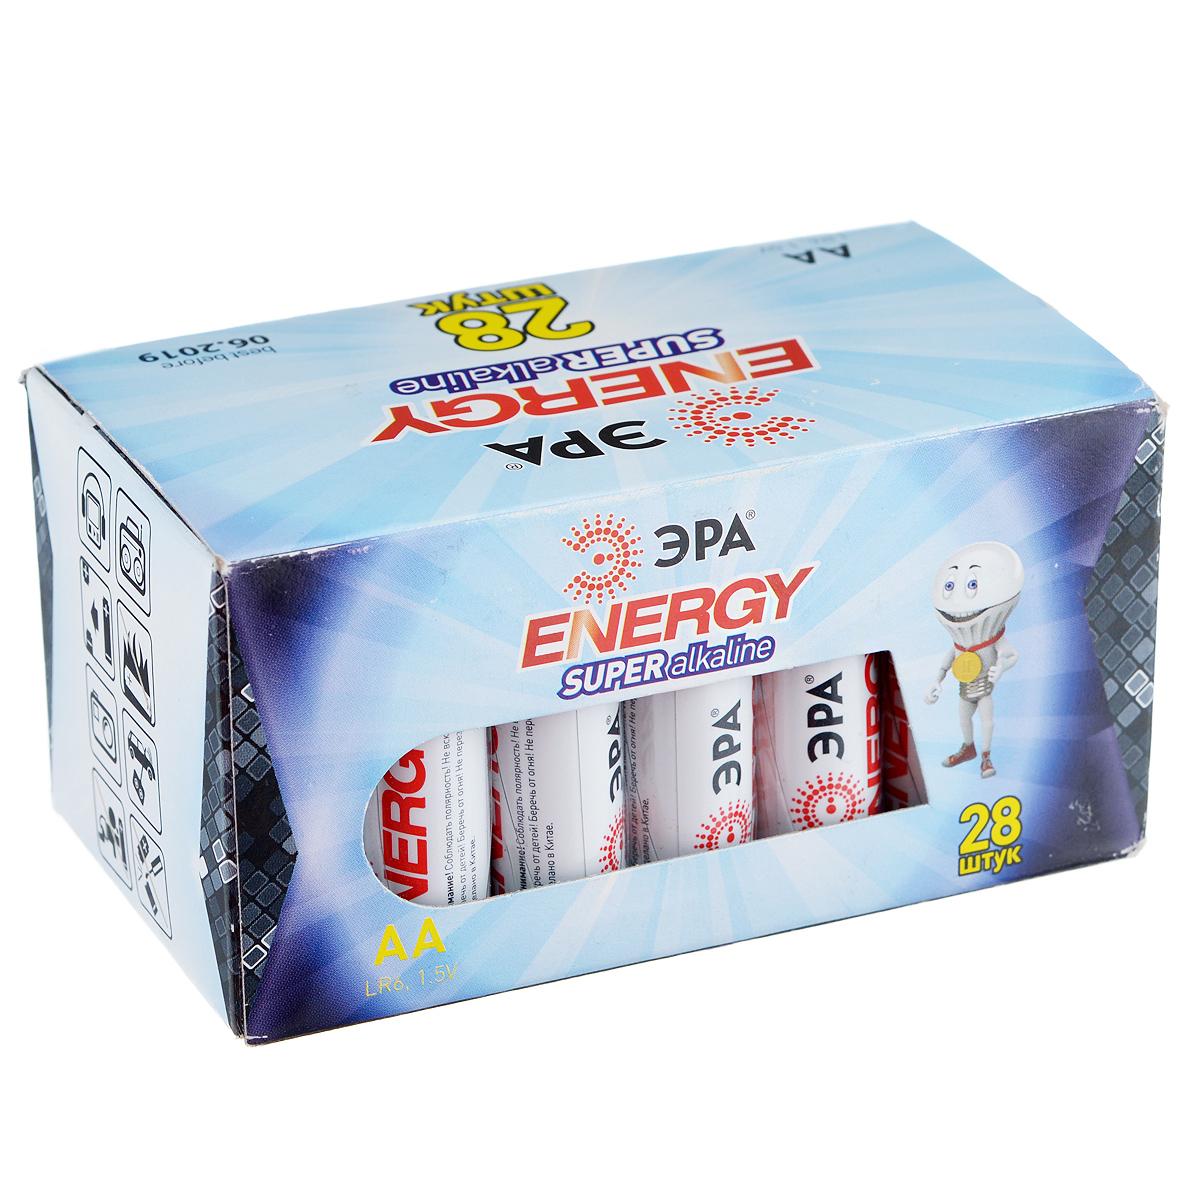 "Батарейка алкалиновая ЭРА ""Energy"", тип AA (LR6-28), 1,5В, 28 шт 5055398651254"